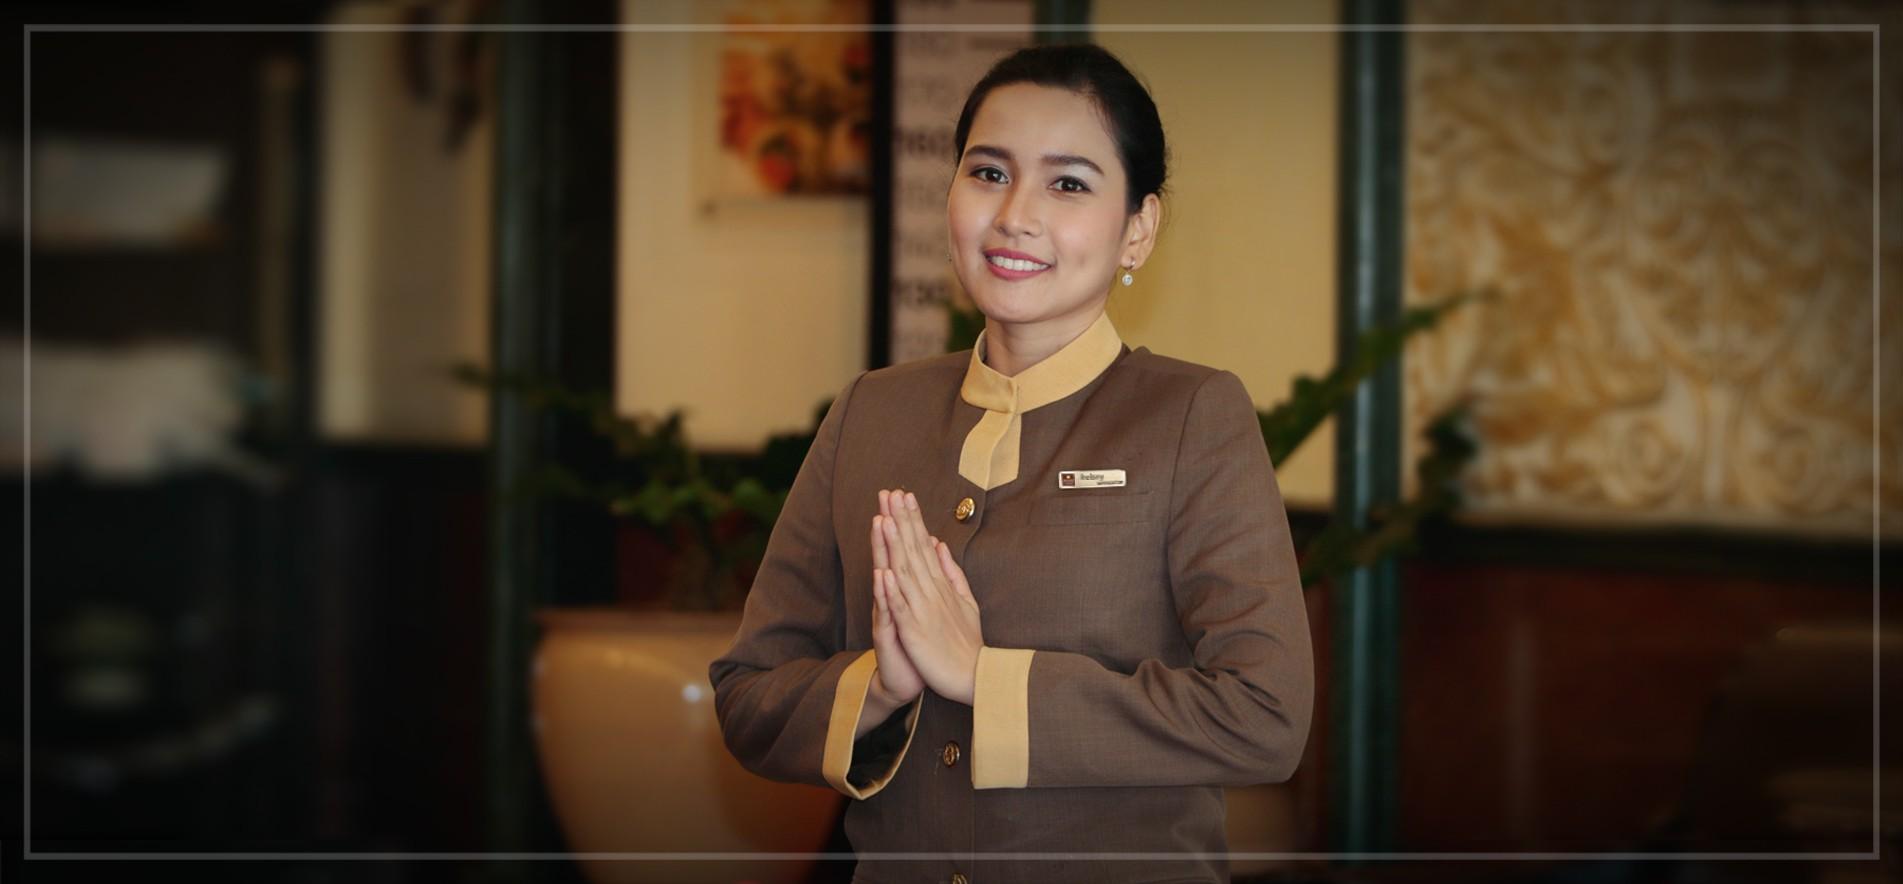 The Jayakarta SP Jakarta Hotel & Spa in Jakarta | Book our